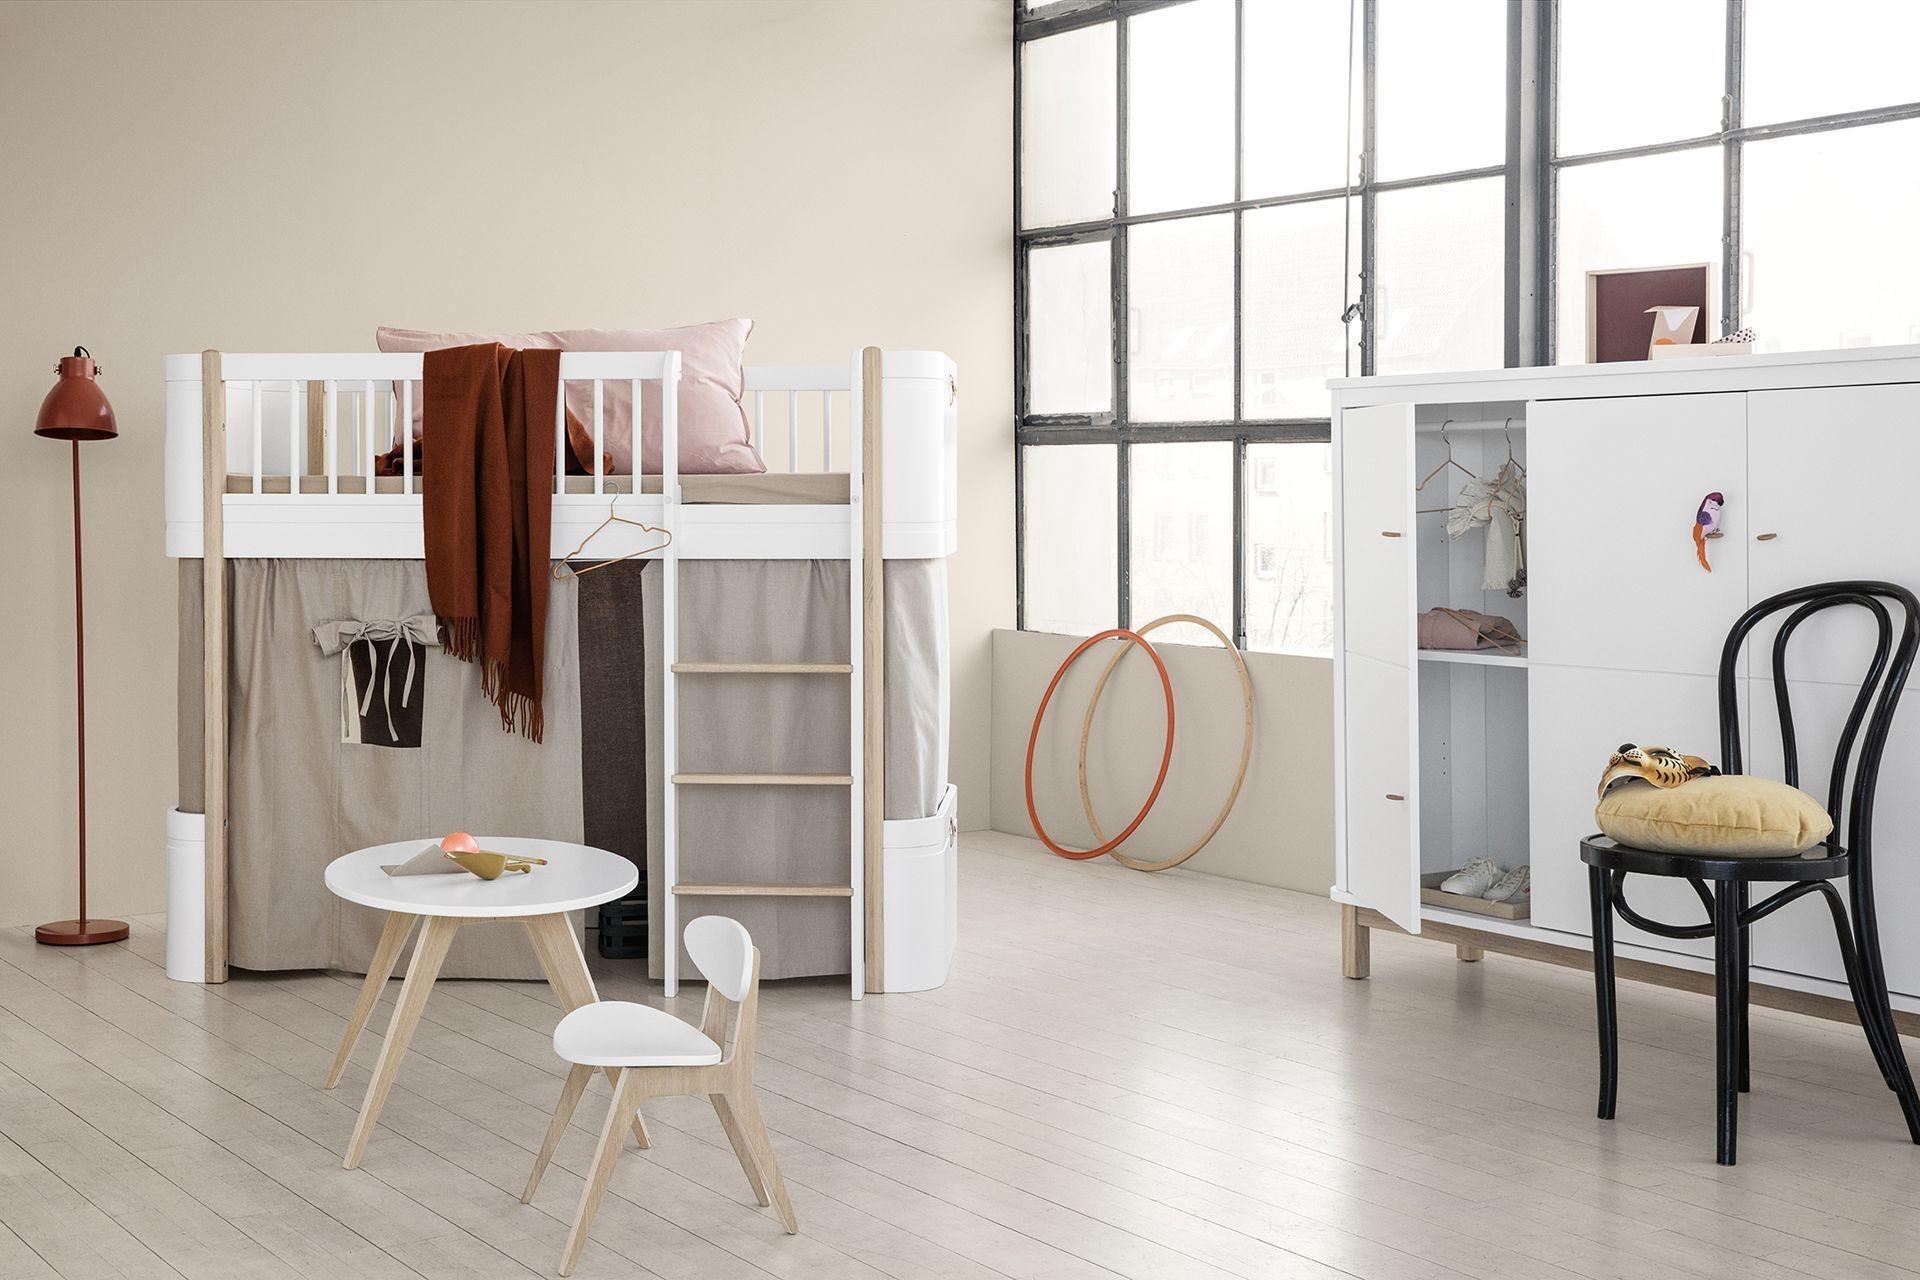 oliver furniture wood mini halbhohes hochbett weieiche kleine fabriek - Oliver Furniture Hochbett